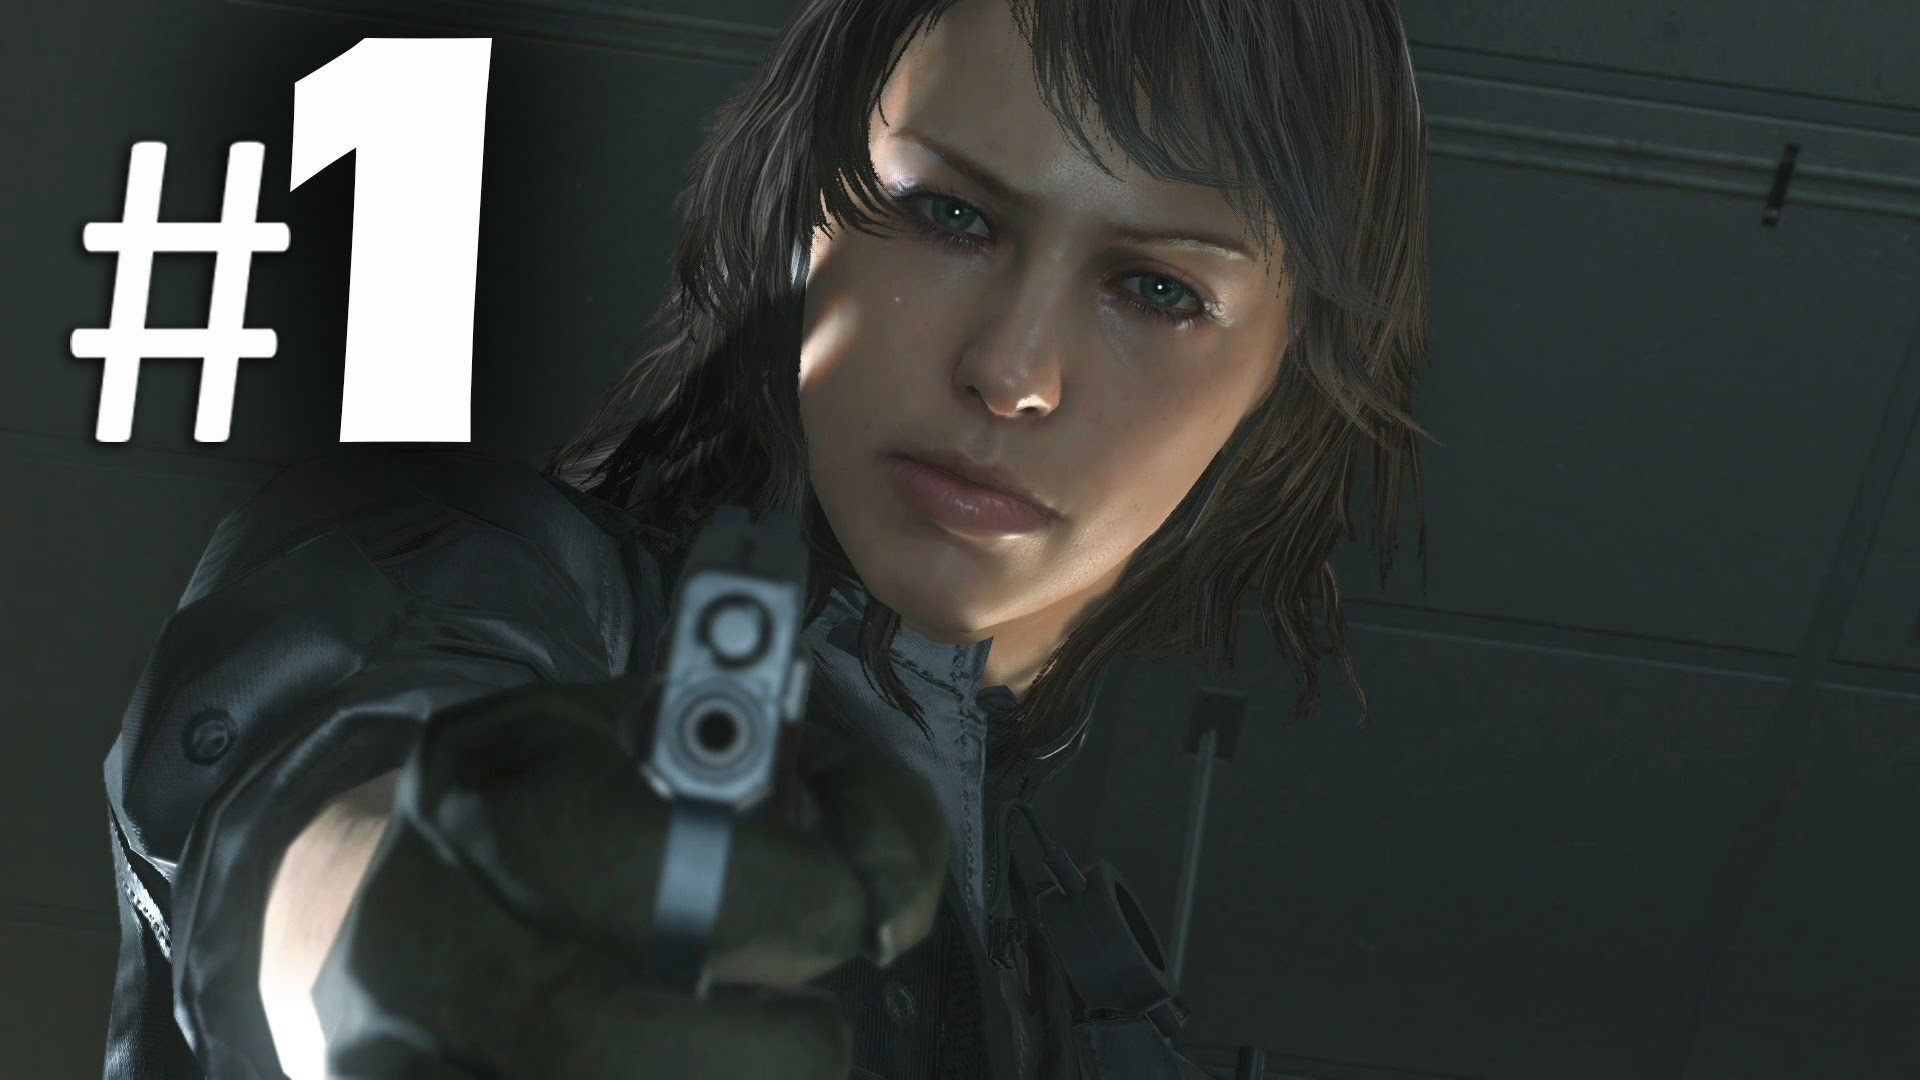 Metal Gear Solid 5 The Phantom Pain Part 1 – Hospital – Gameplay  Walkthrough PS4 (MGS5) – YouTube